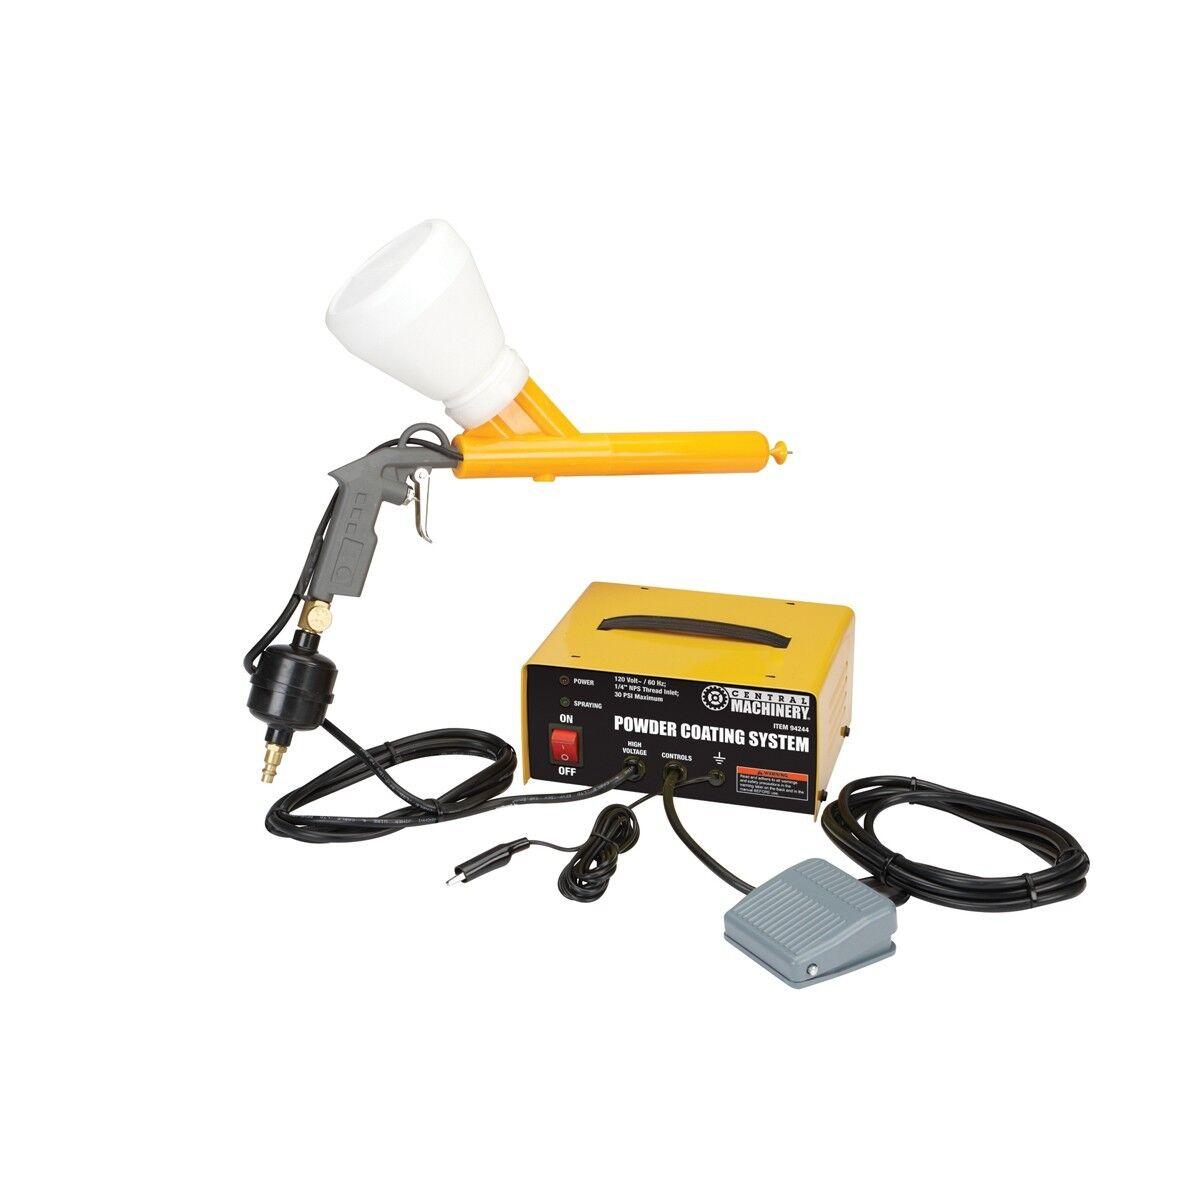 Powder Coating Sprayer Coater System Kit Uses Any Standard Standard Standard Powder Coat Paint c8b5b2